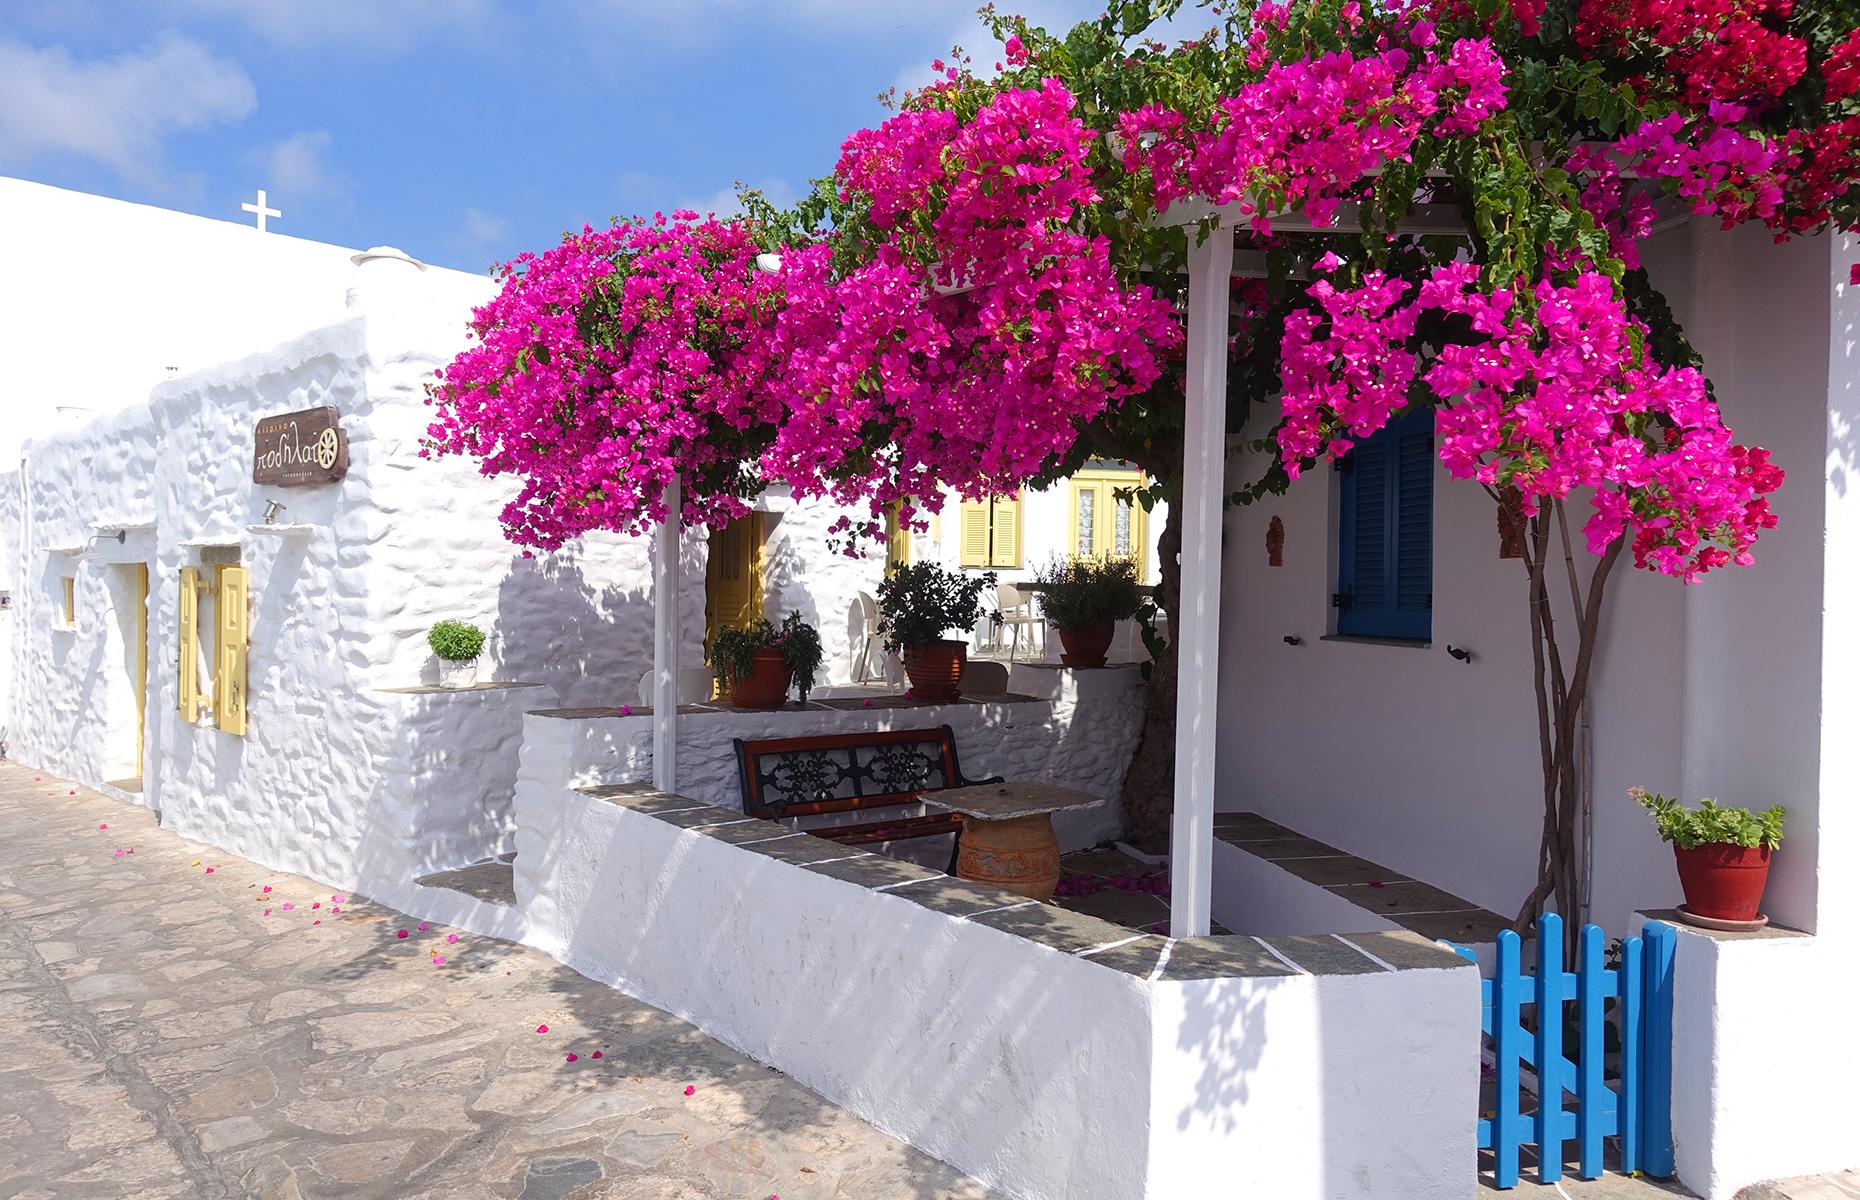 Artemonas village on Sifnos (Image: Aerial-motion/Shutterstock)